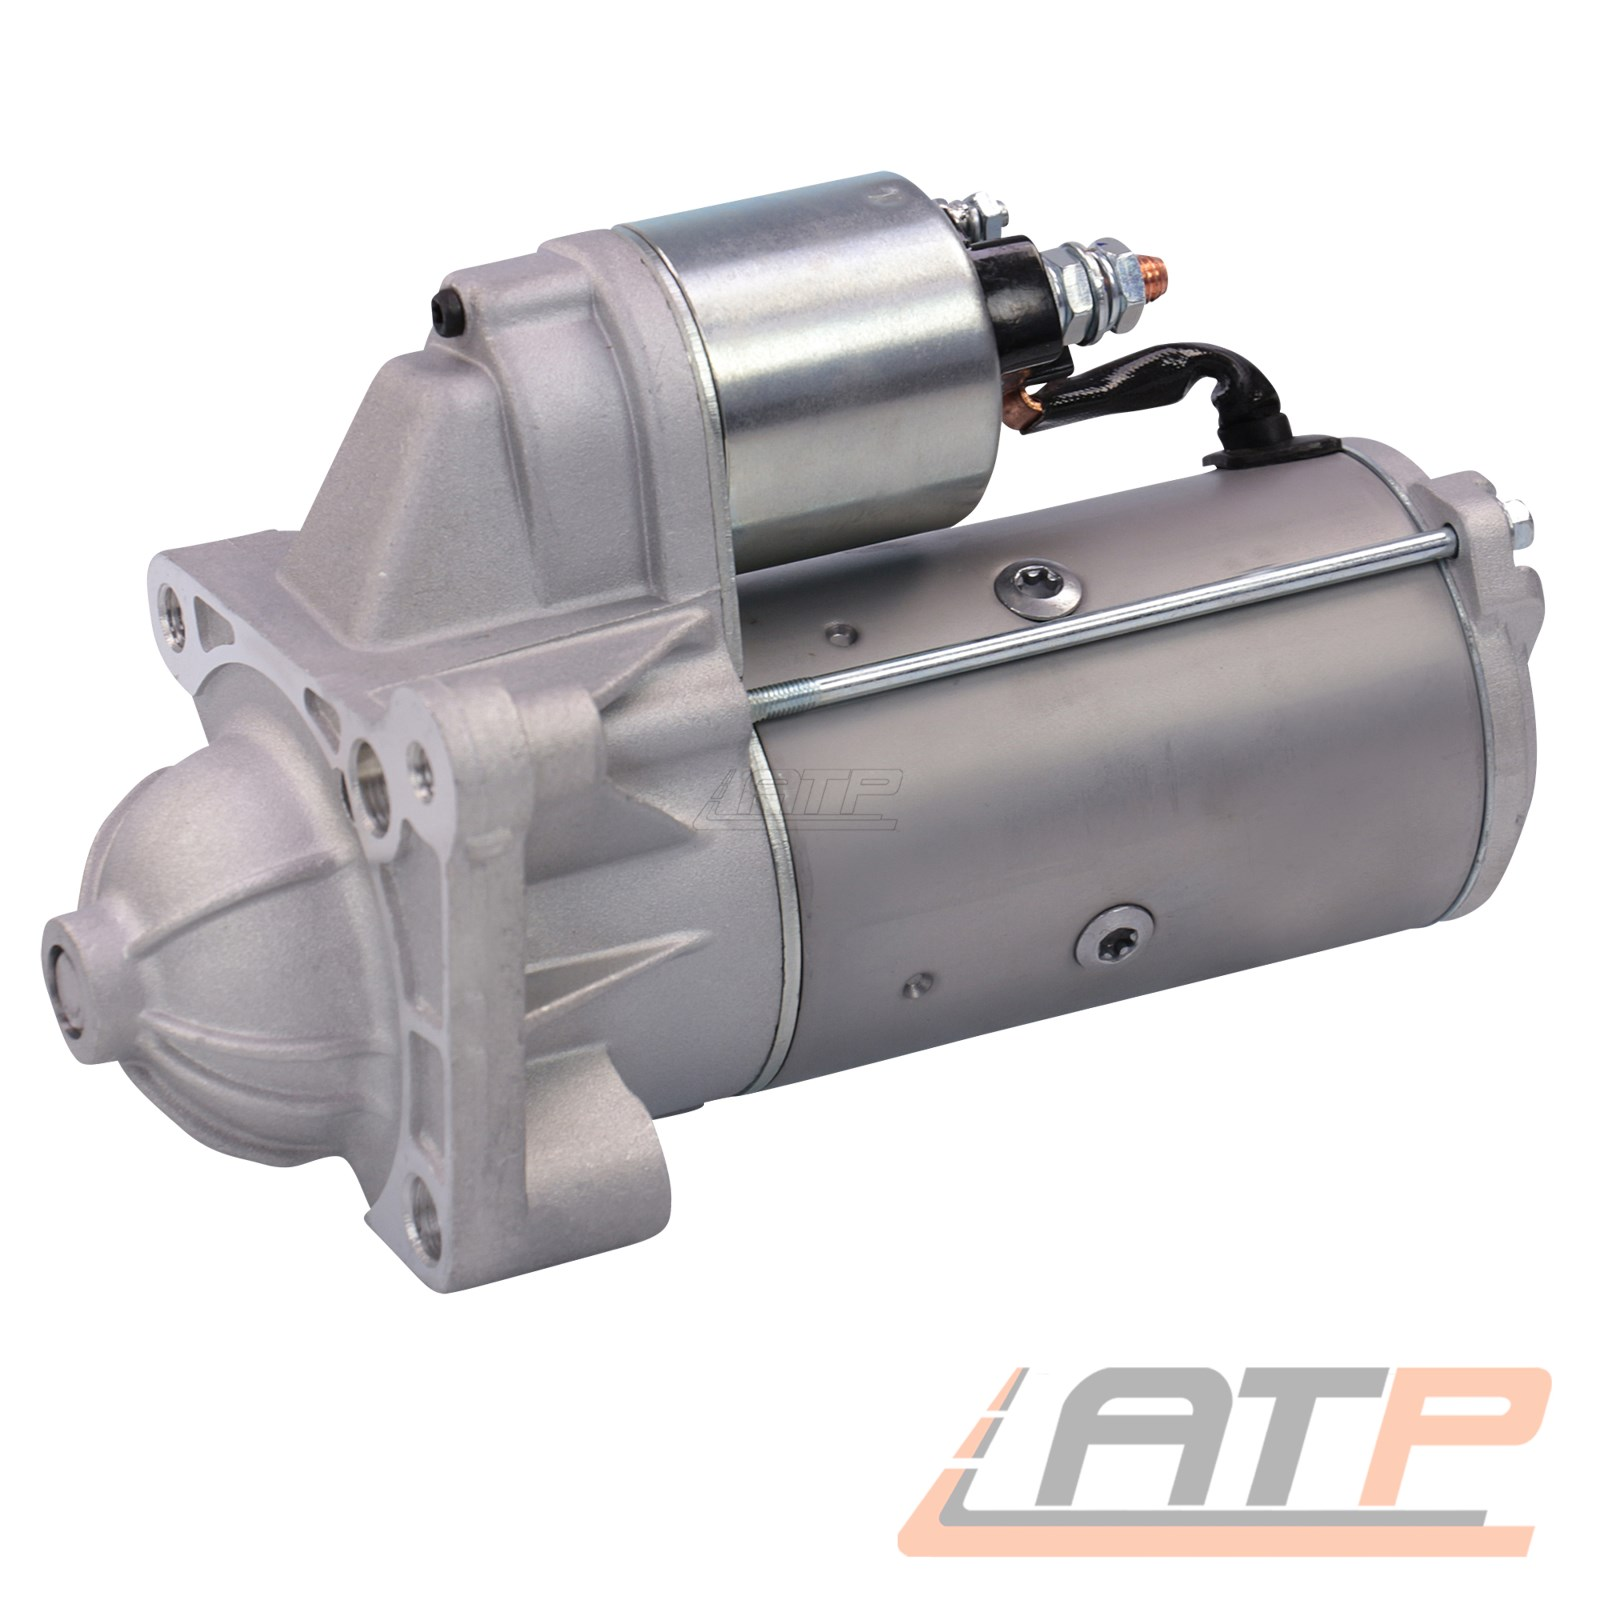 anlasser starter 1,8 kw nissan primera p12 wp12 1.9 dci bj 03-10 | ebay